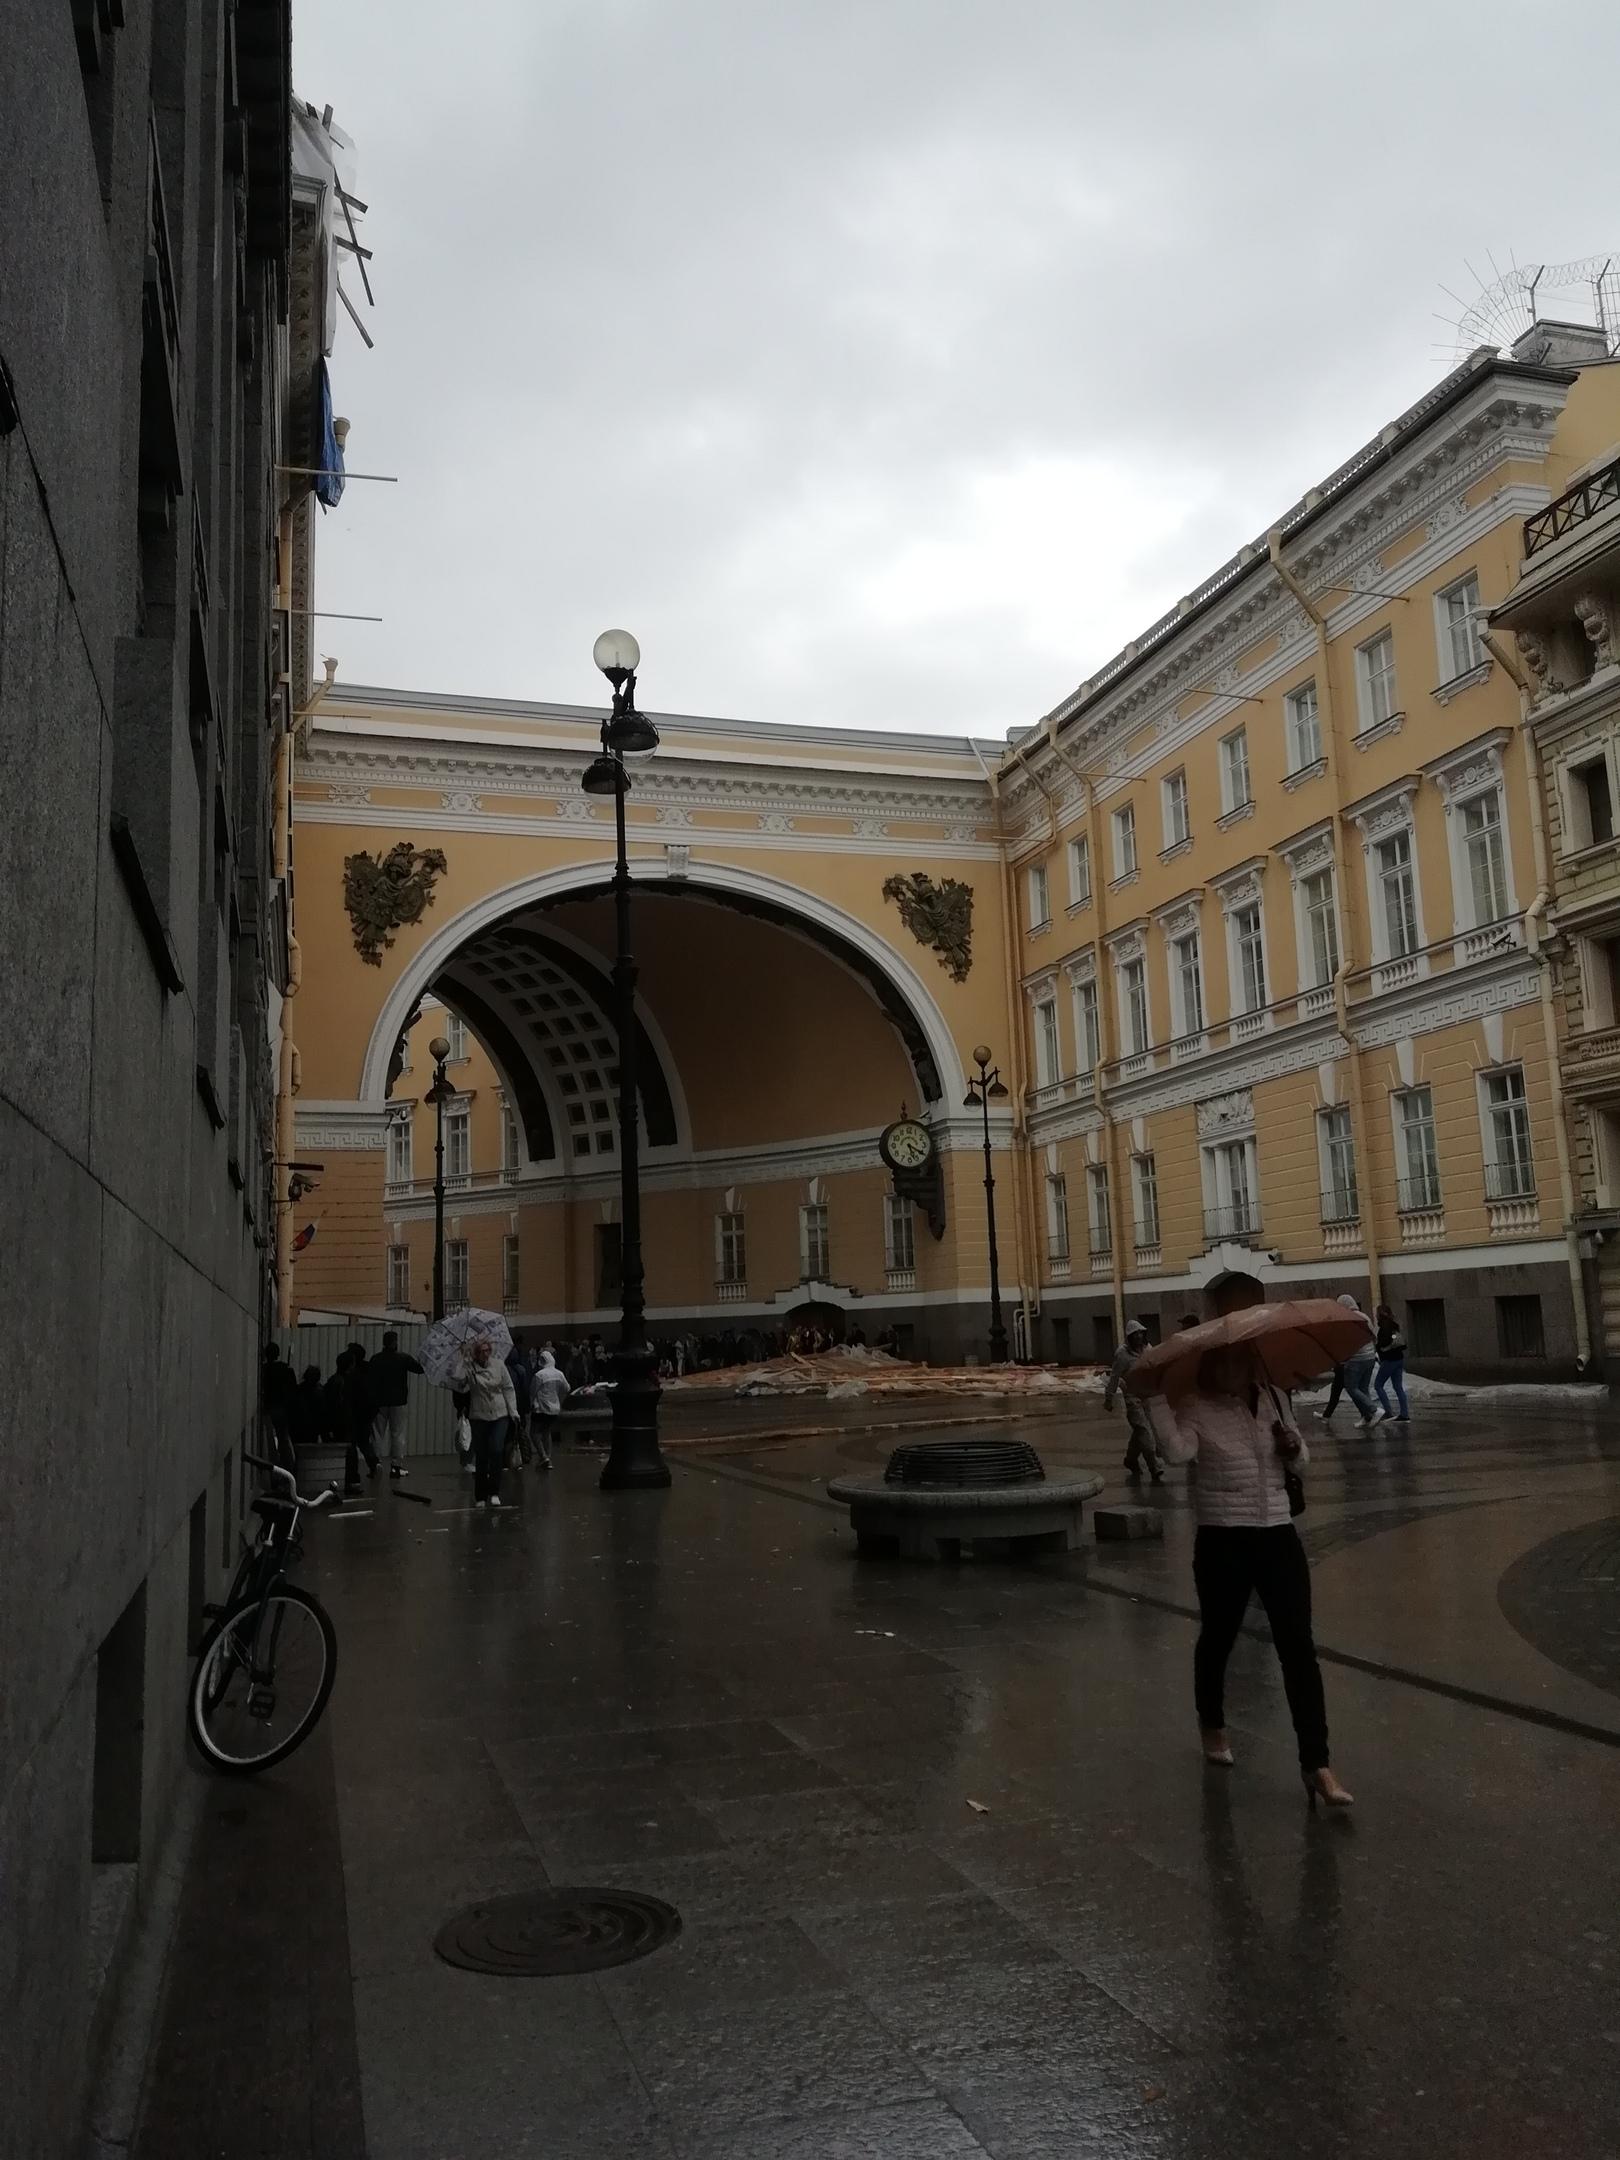 Группа «ДТП и ЧП | Санкт-Петербург | Питер Онлайн | СПб» во «ВКонтакте»